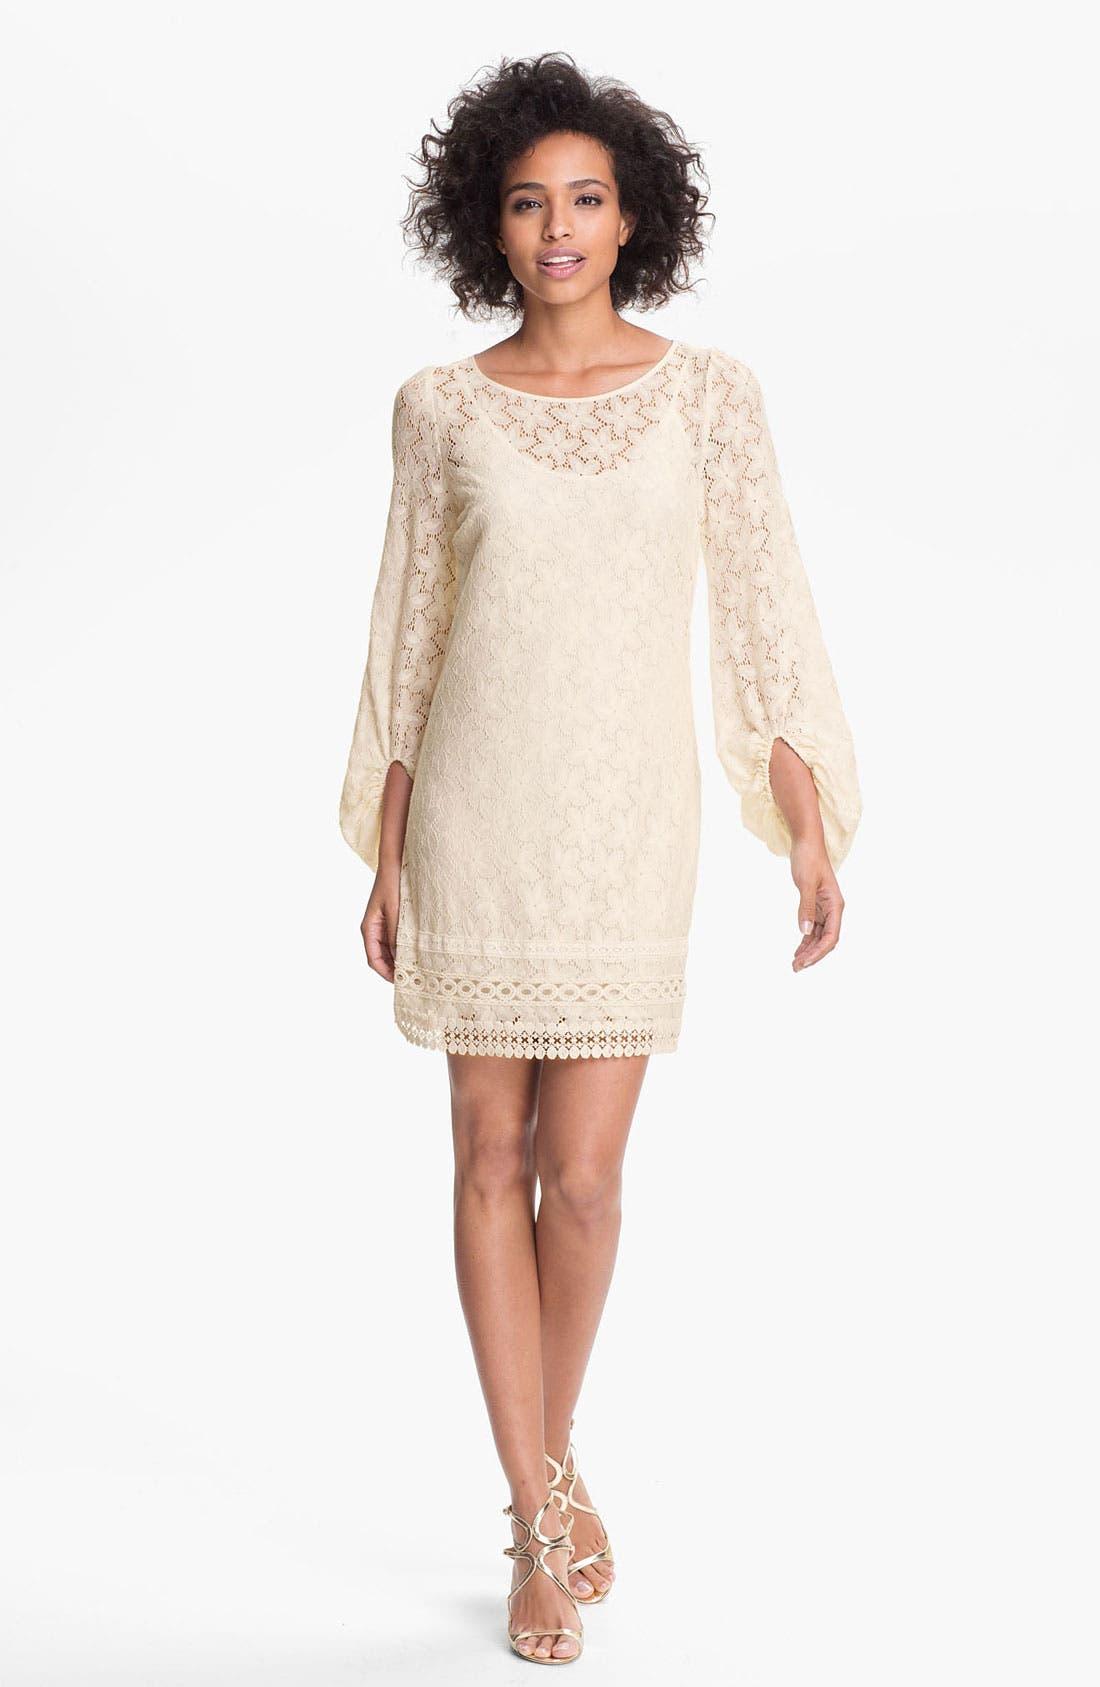 Alternate Image 1 Selected - Laundry by Shelli Segal 'Sand Dollar' Lace Shift Dress (Petite)